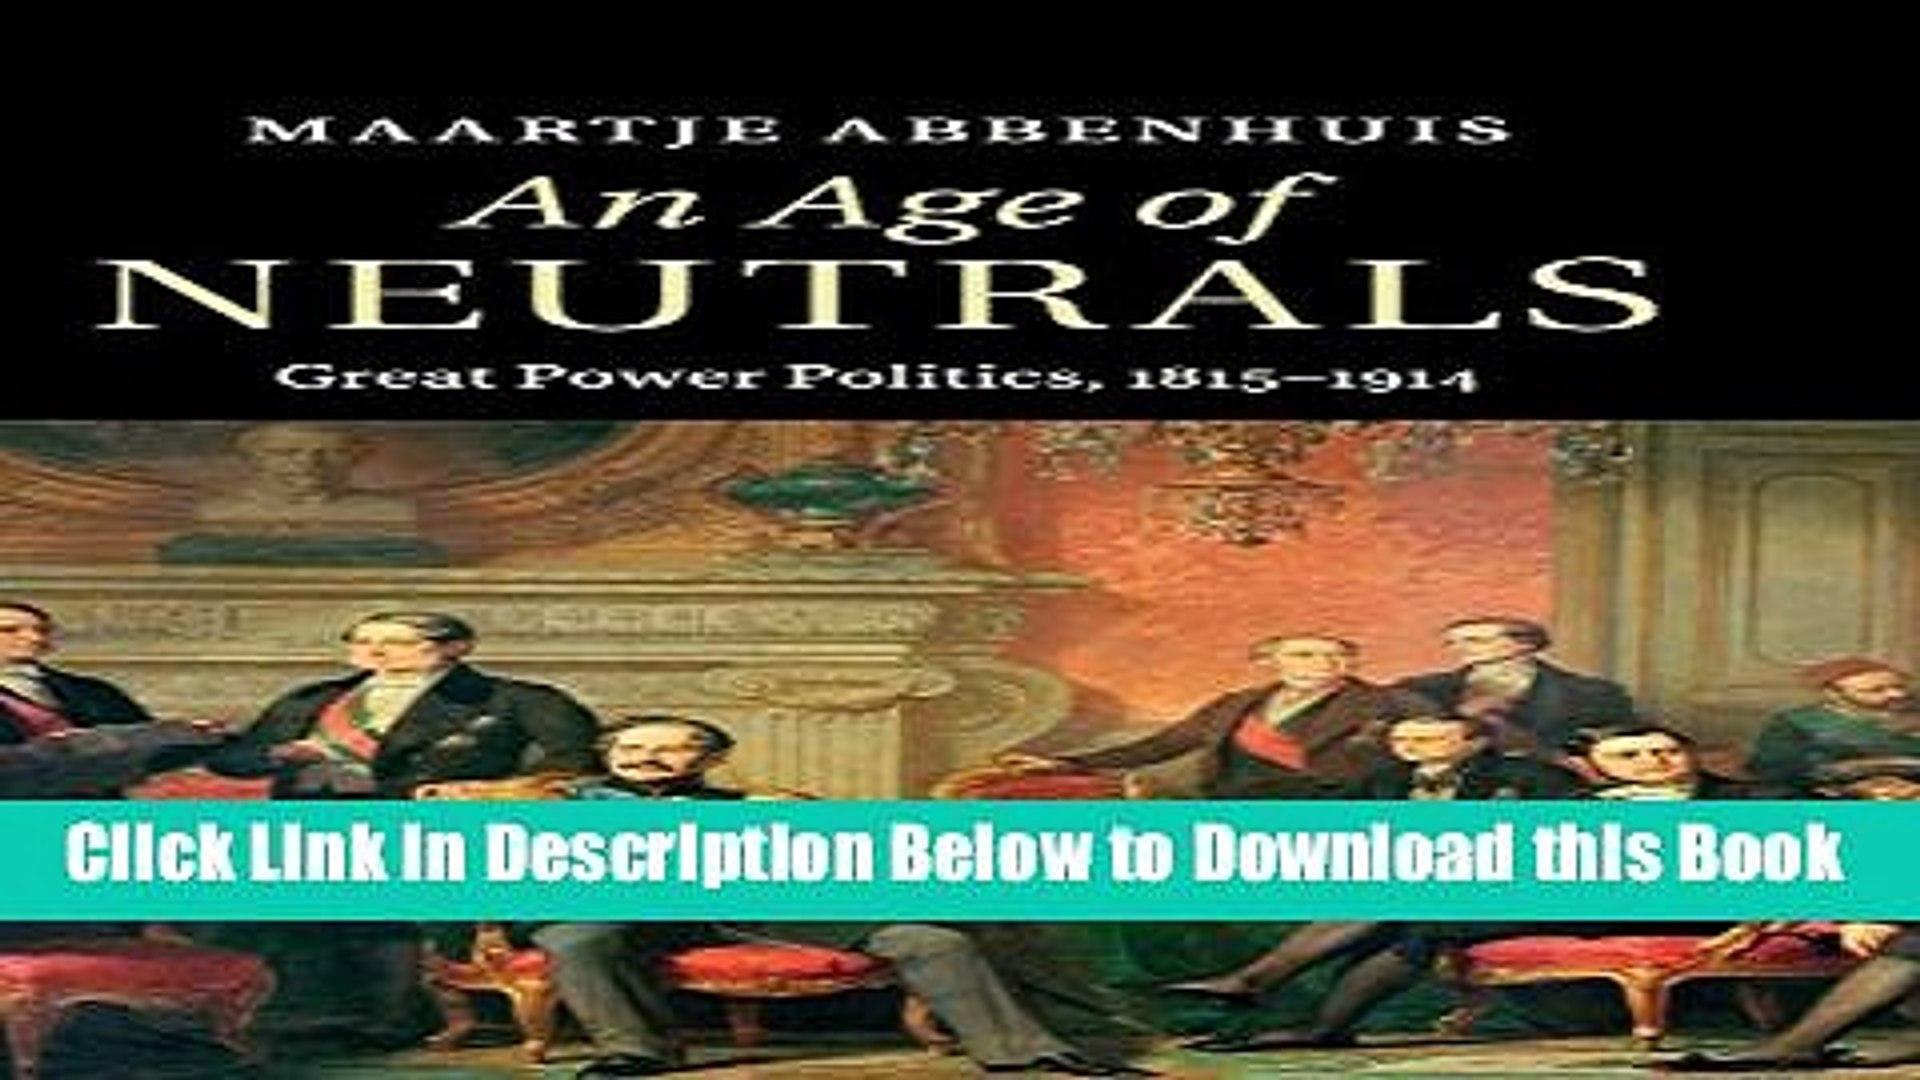 [Download] An Age of Neutrals: Great Power Politics, 1815-1914 Online Ebook